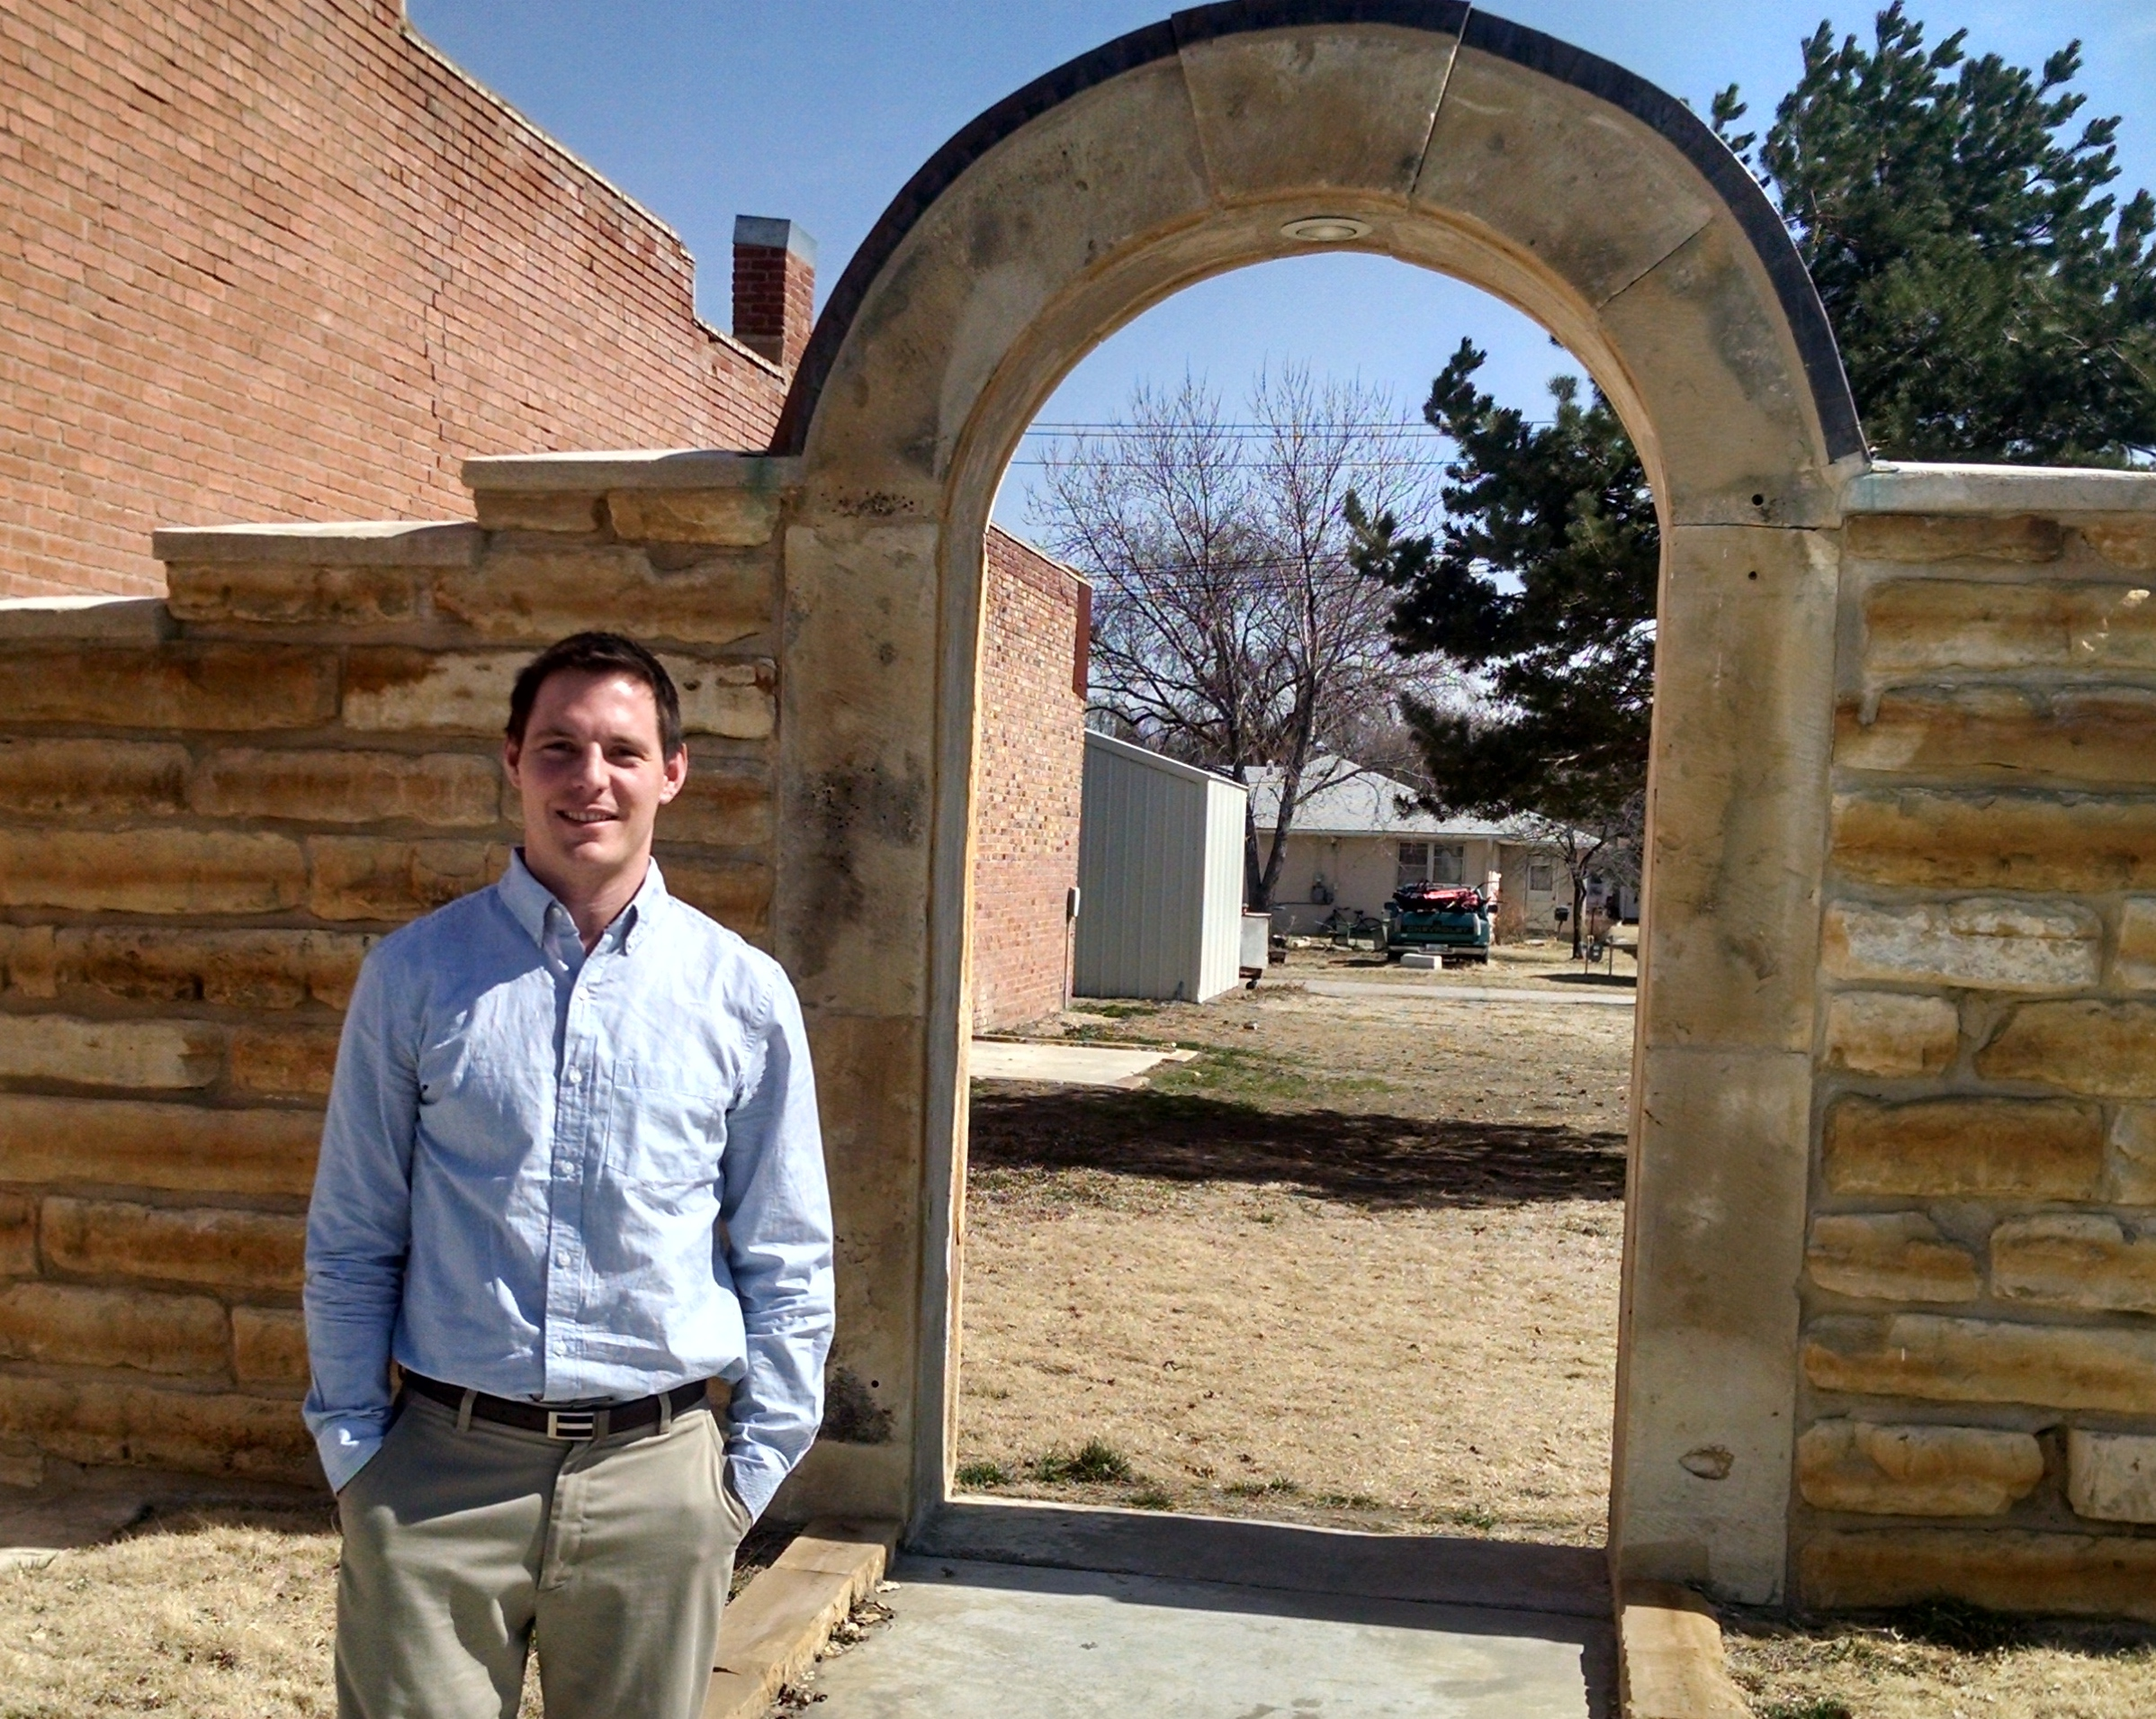 Kansas republic county agenda - Luke Mahin Is The Economic Development Director For Republic County Kansas